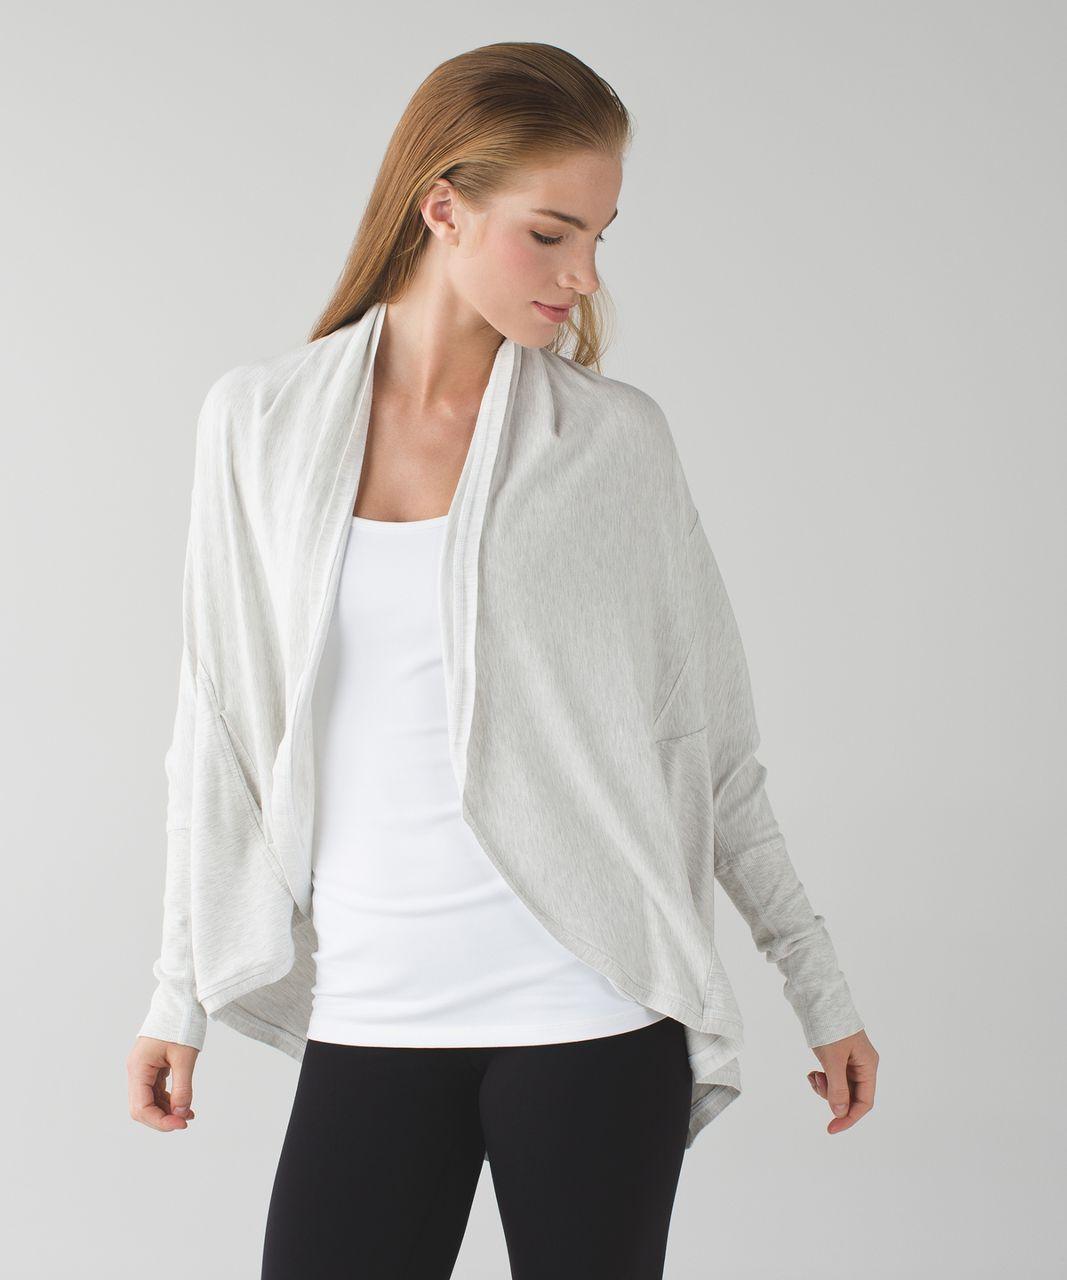 Lululemon To & Flow Wrap - Heathered Mod White - lulu fanatics